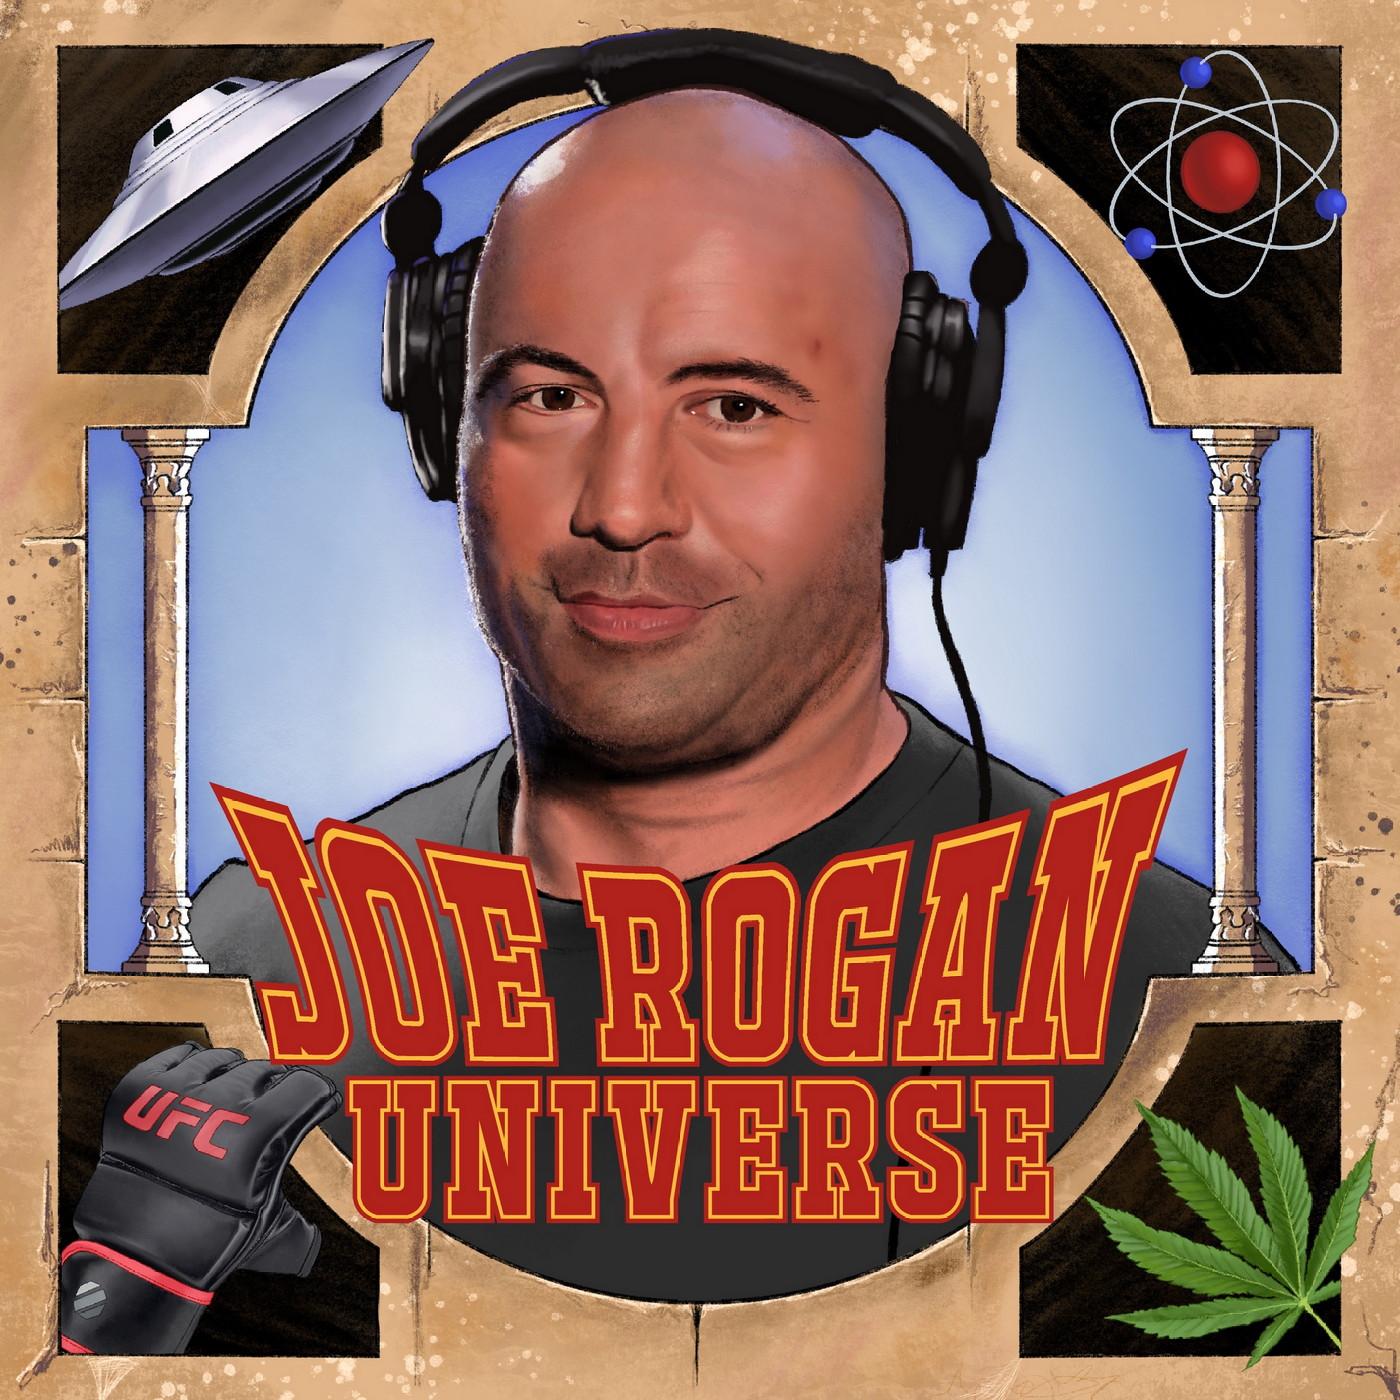 Joe Rogan Experience Review podcast podcast